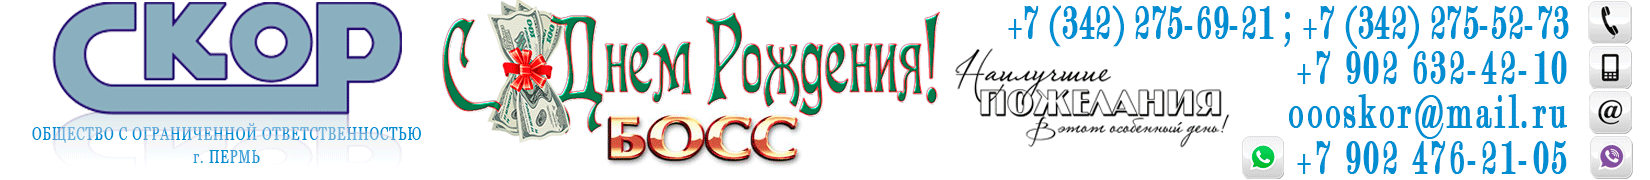 Логотип Сайта ноябрь